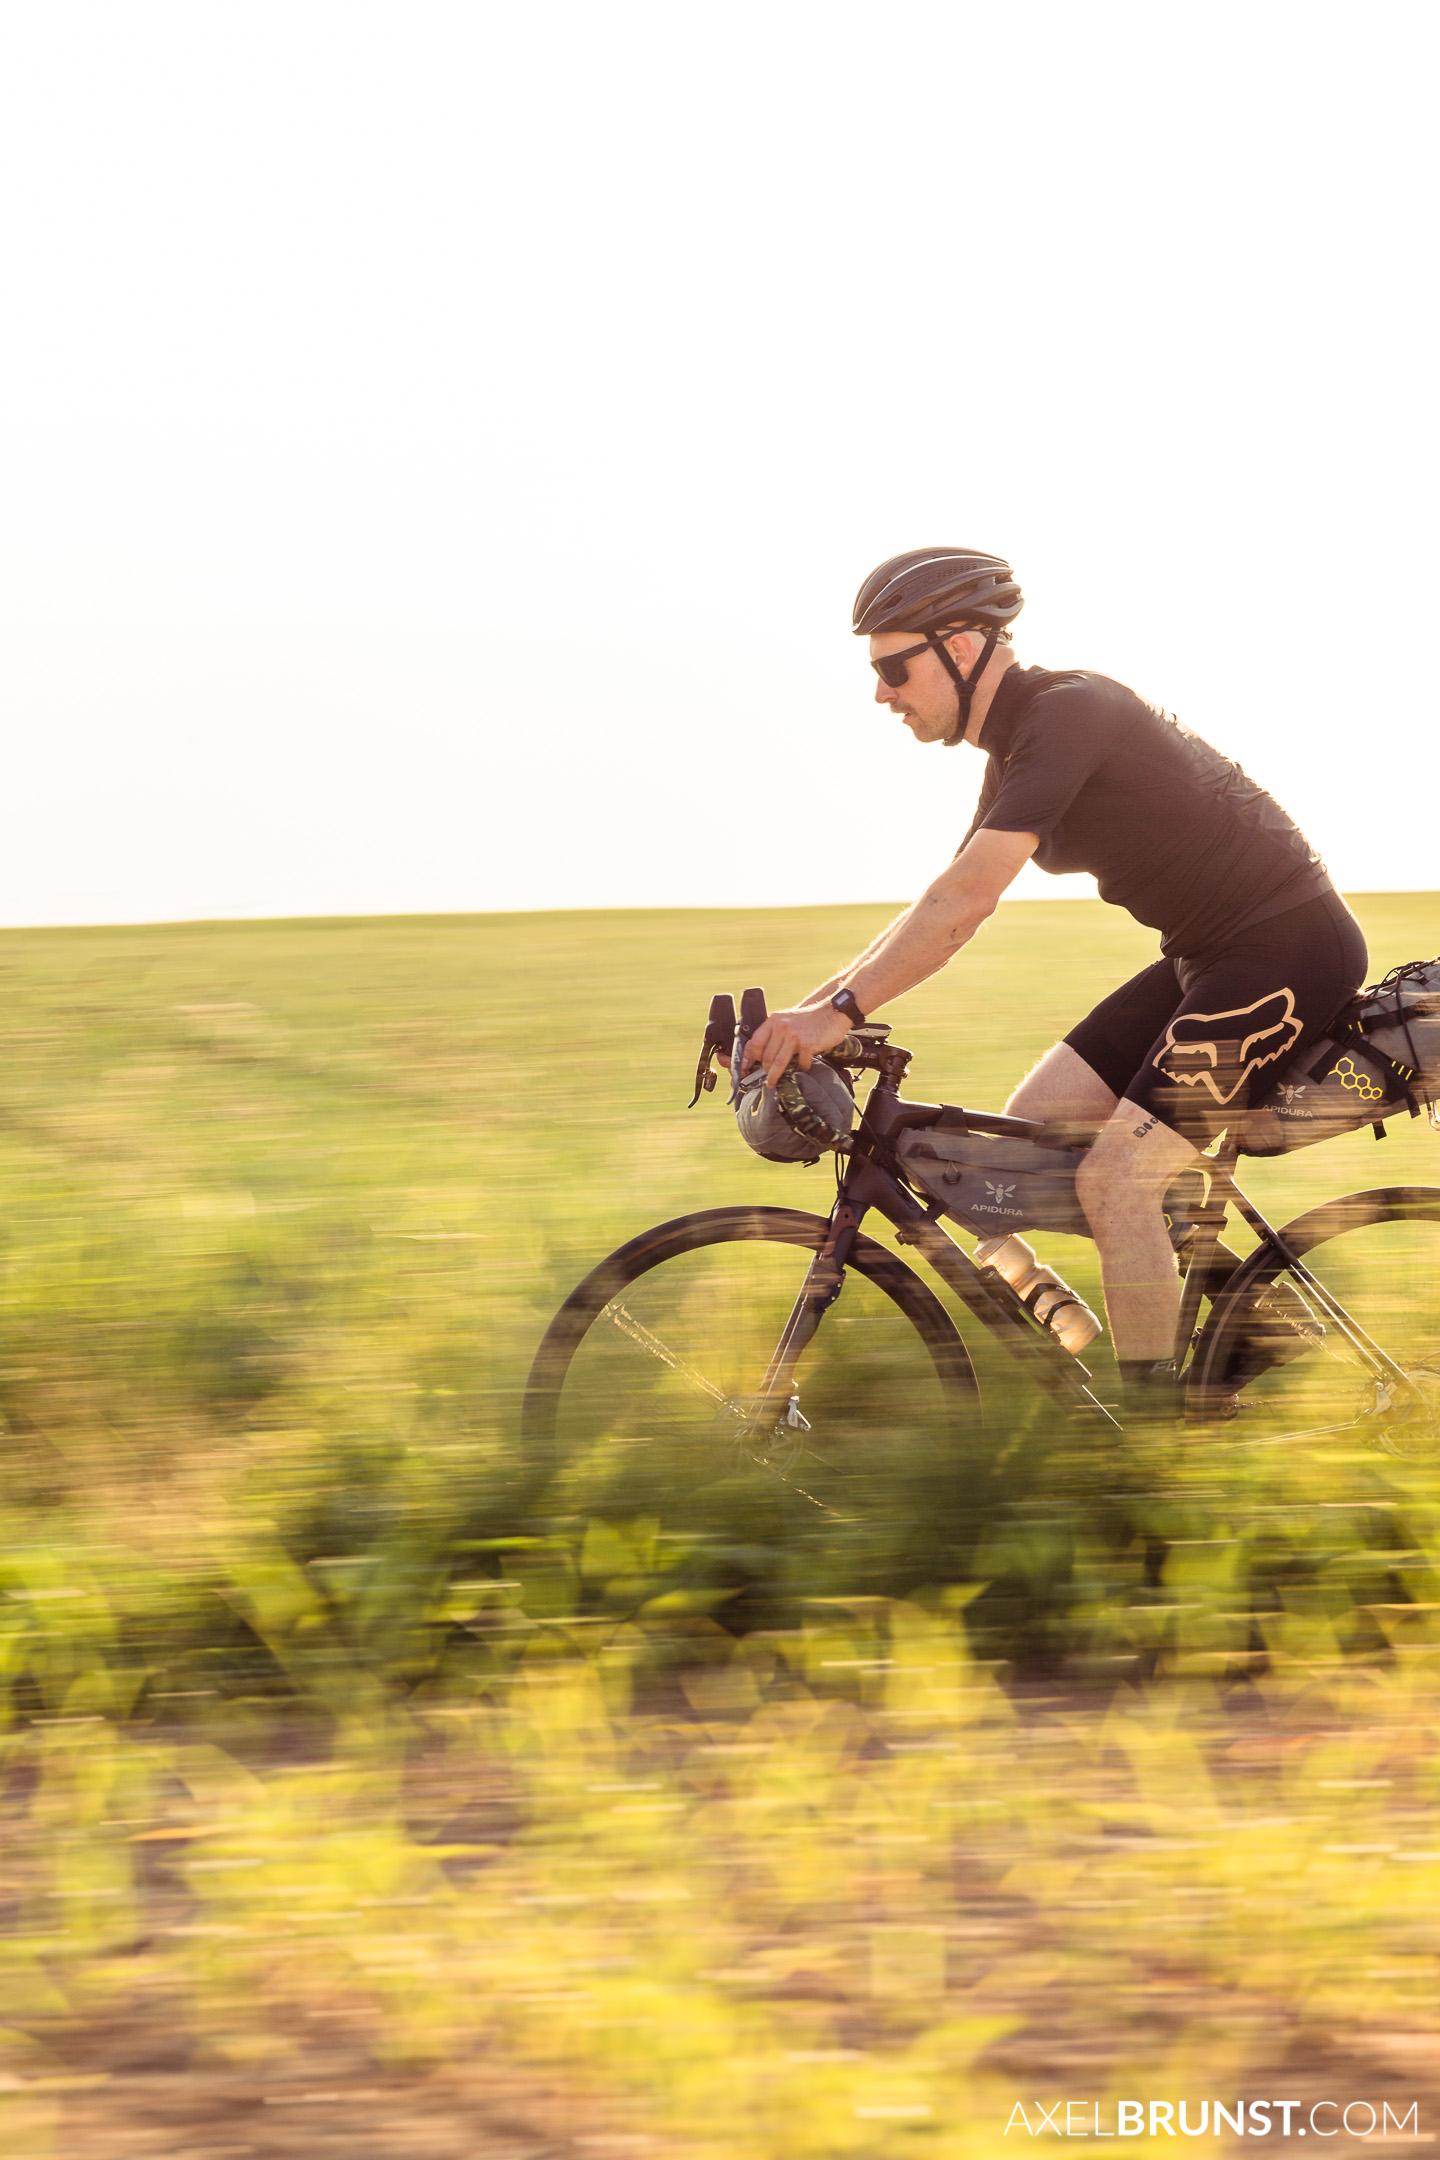 Fabi-Scholz-Bikepacking-5.jpg